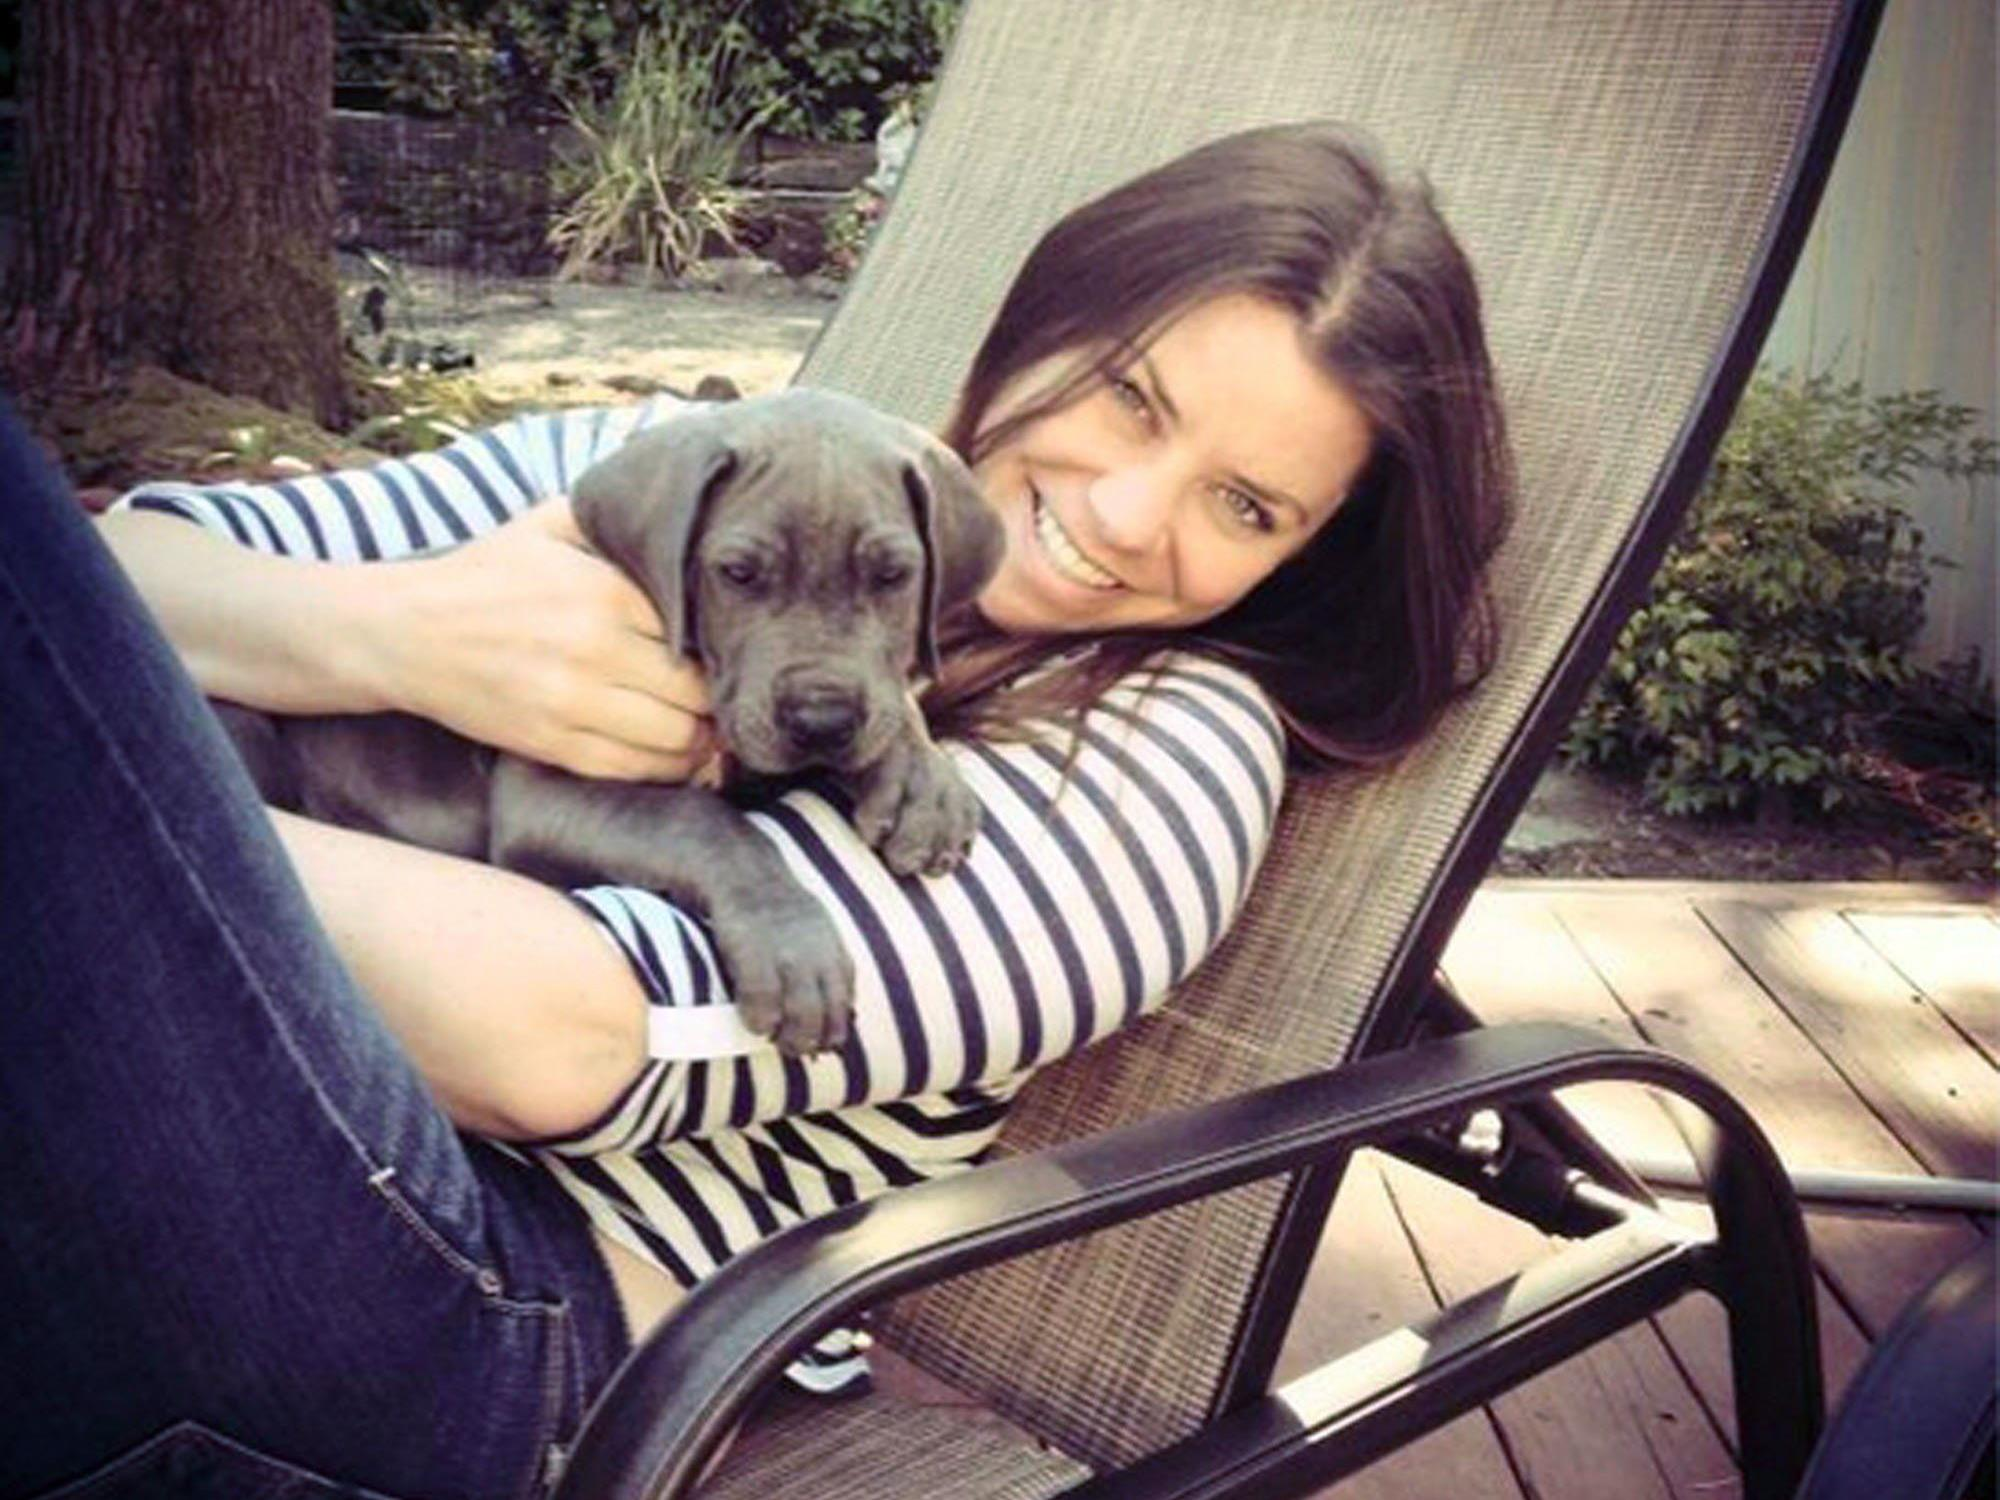 Brittany Maynard entfachte die Debatte um aktive Sterbehilfe neu.